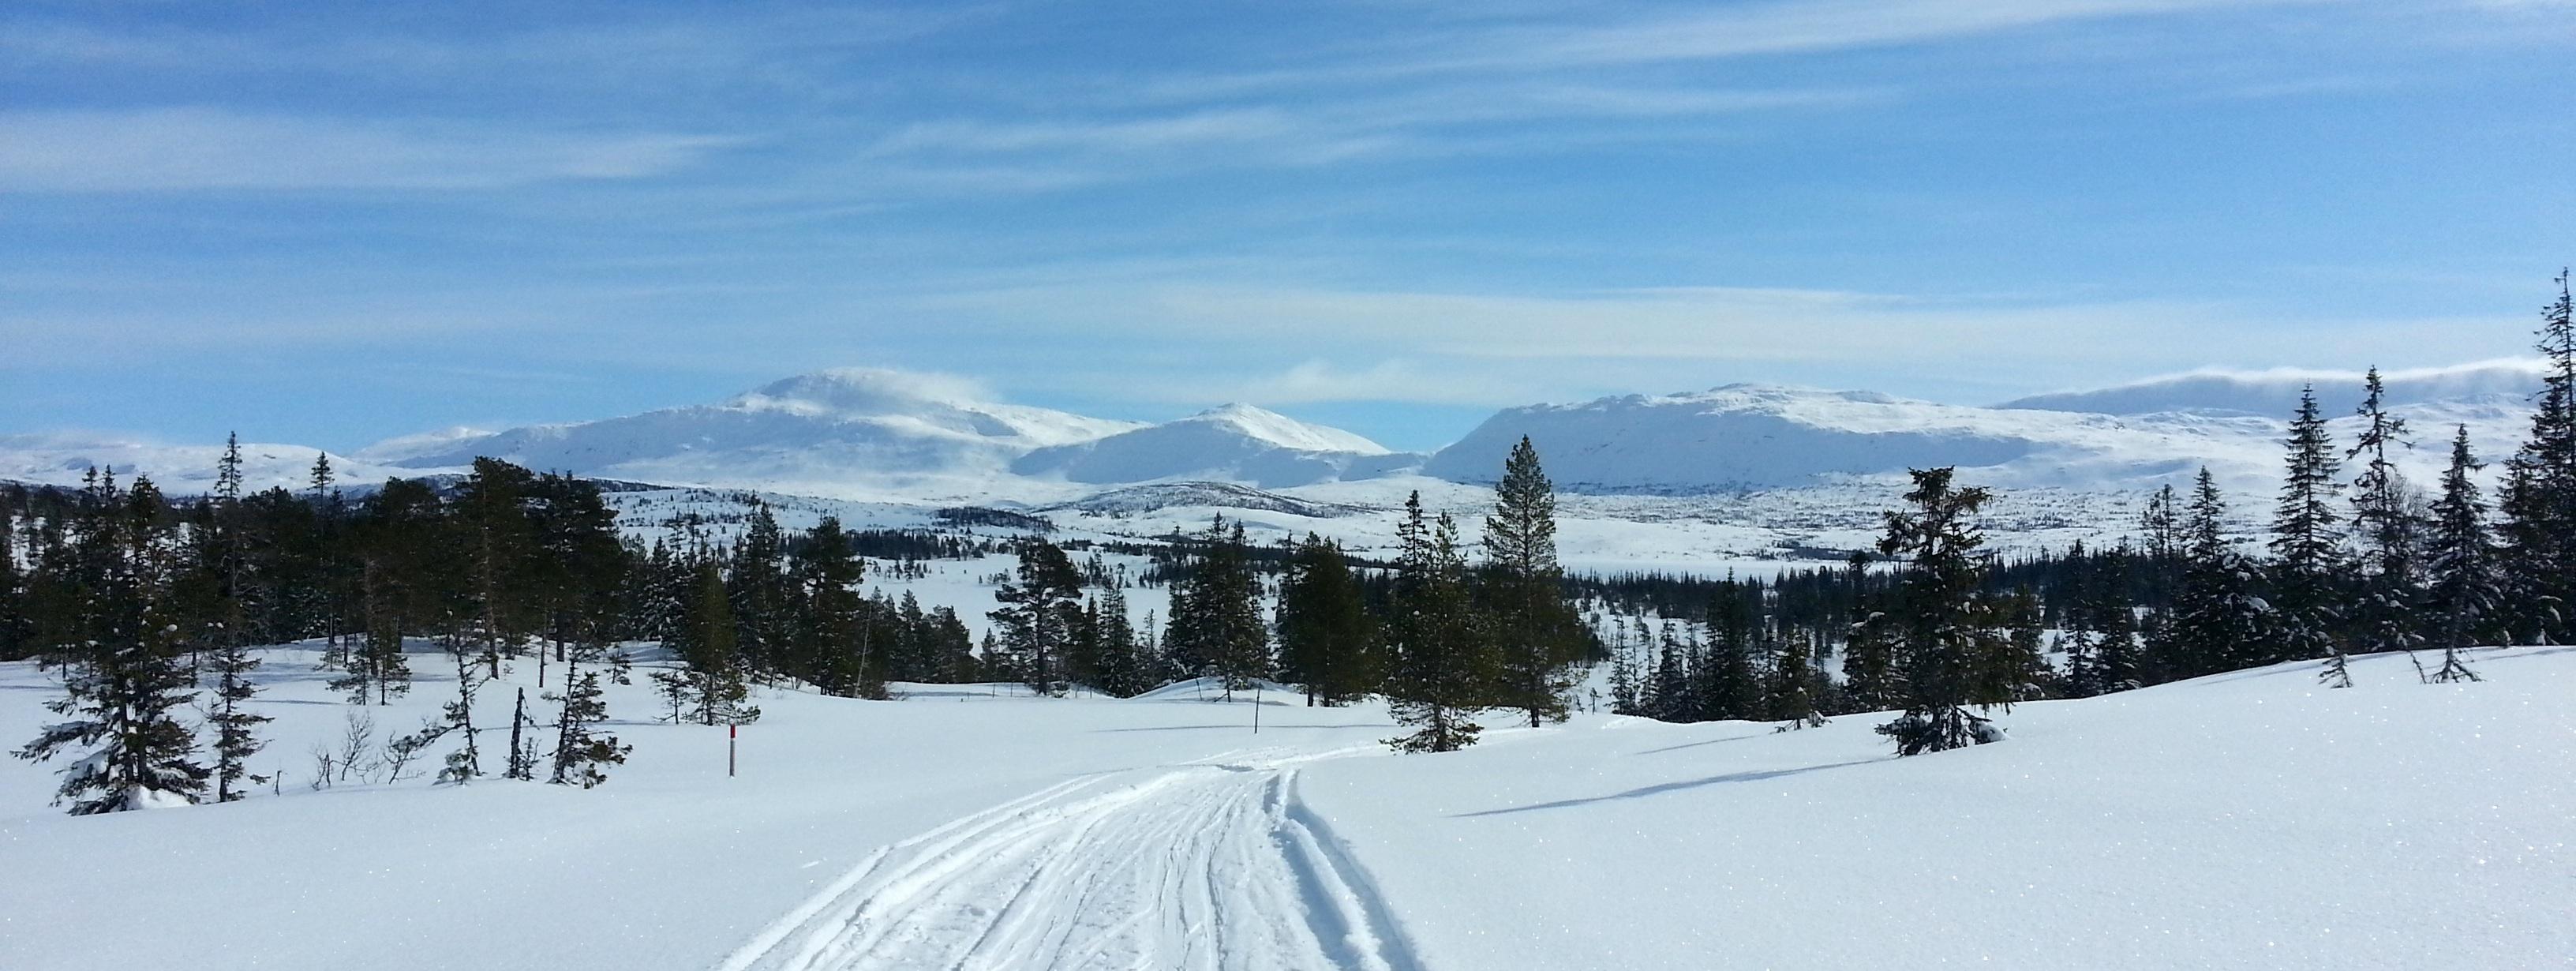 gratis chat norge Ski